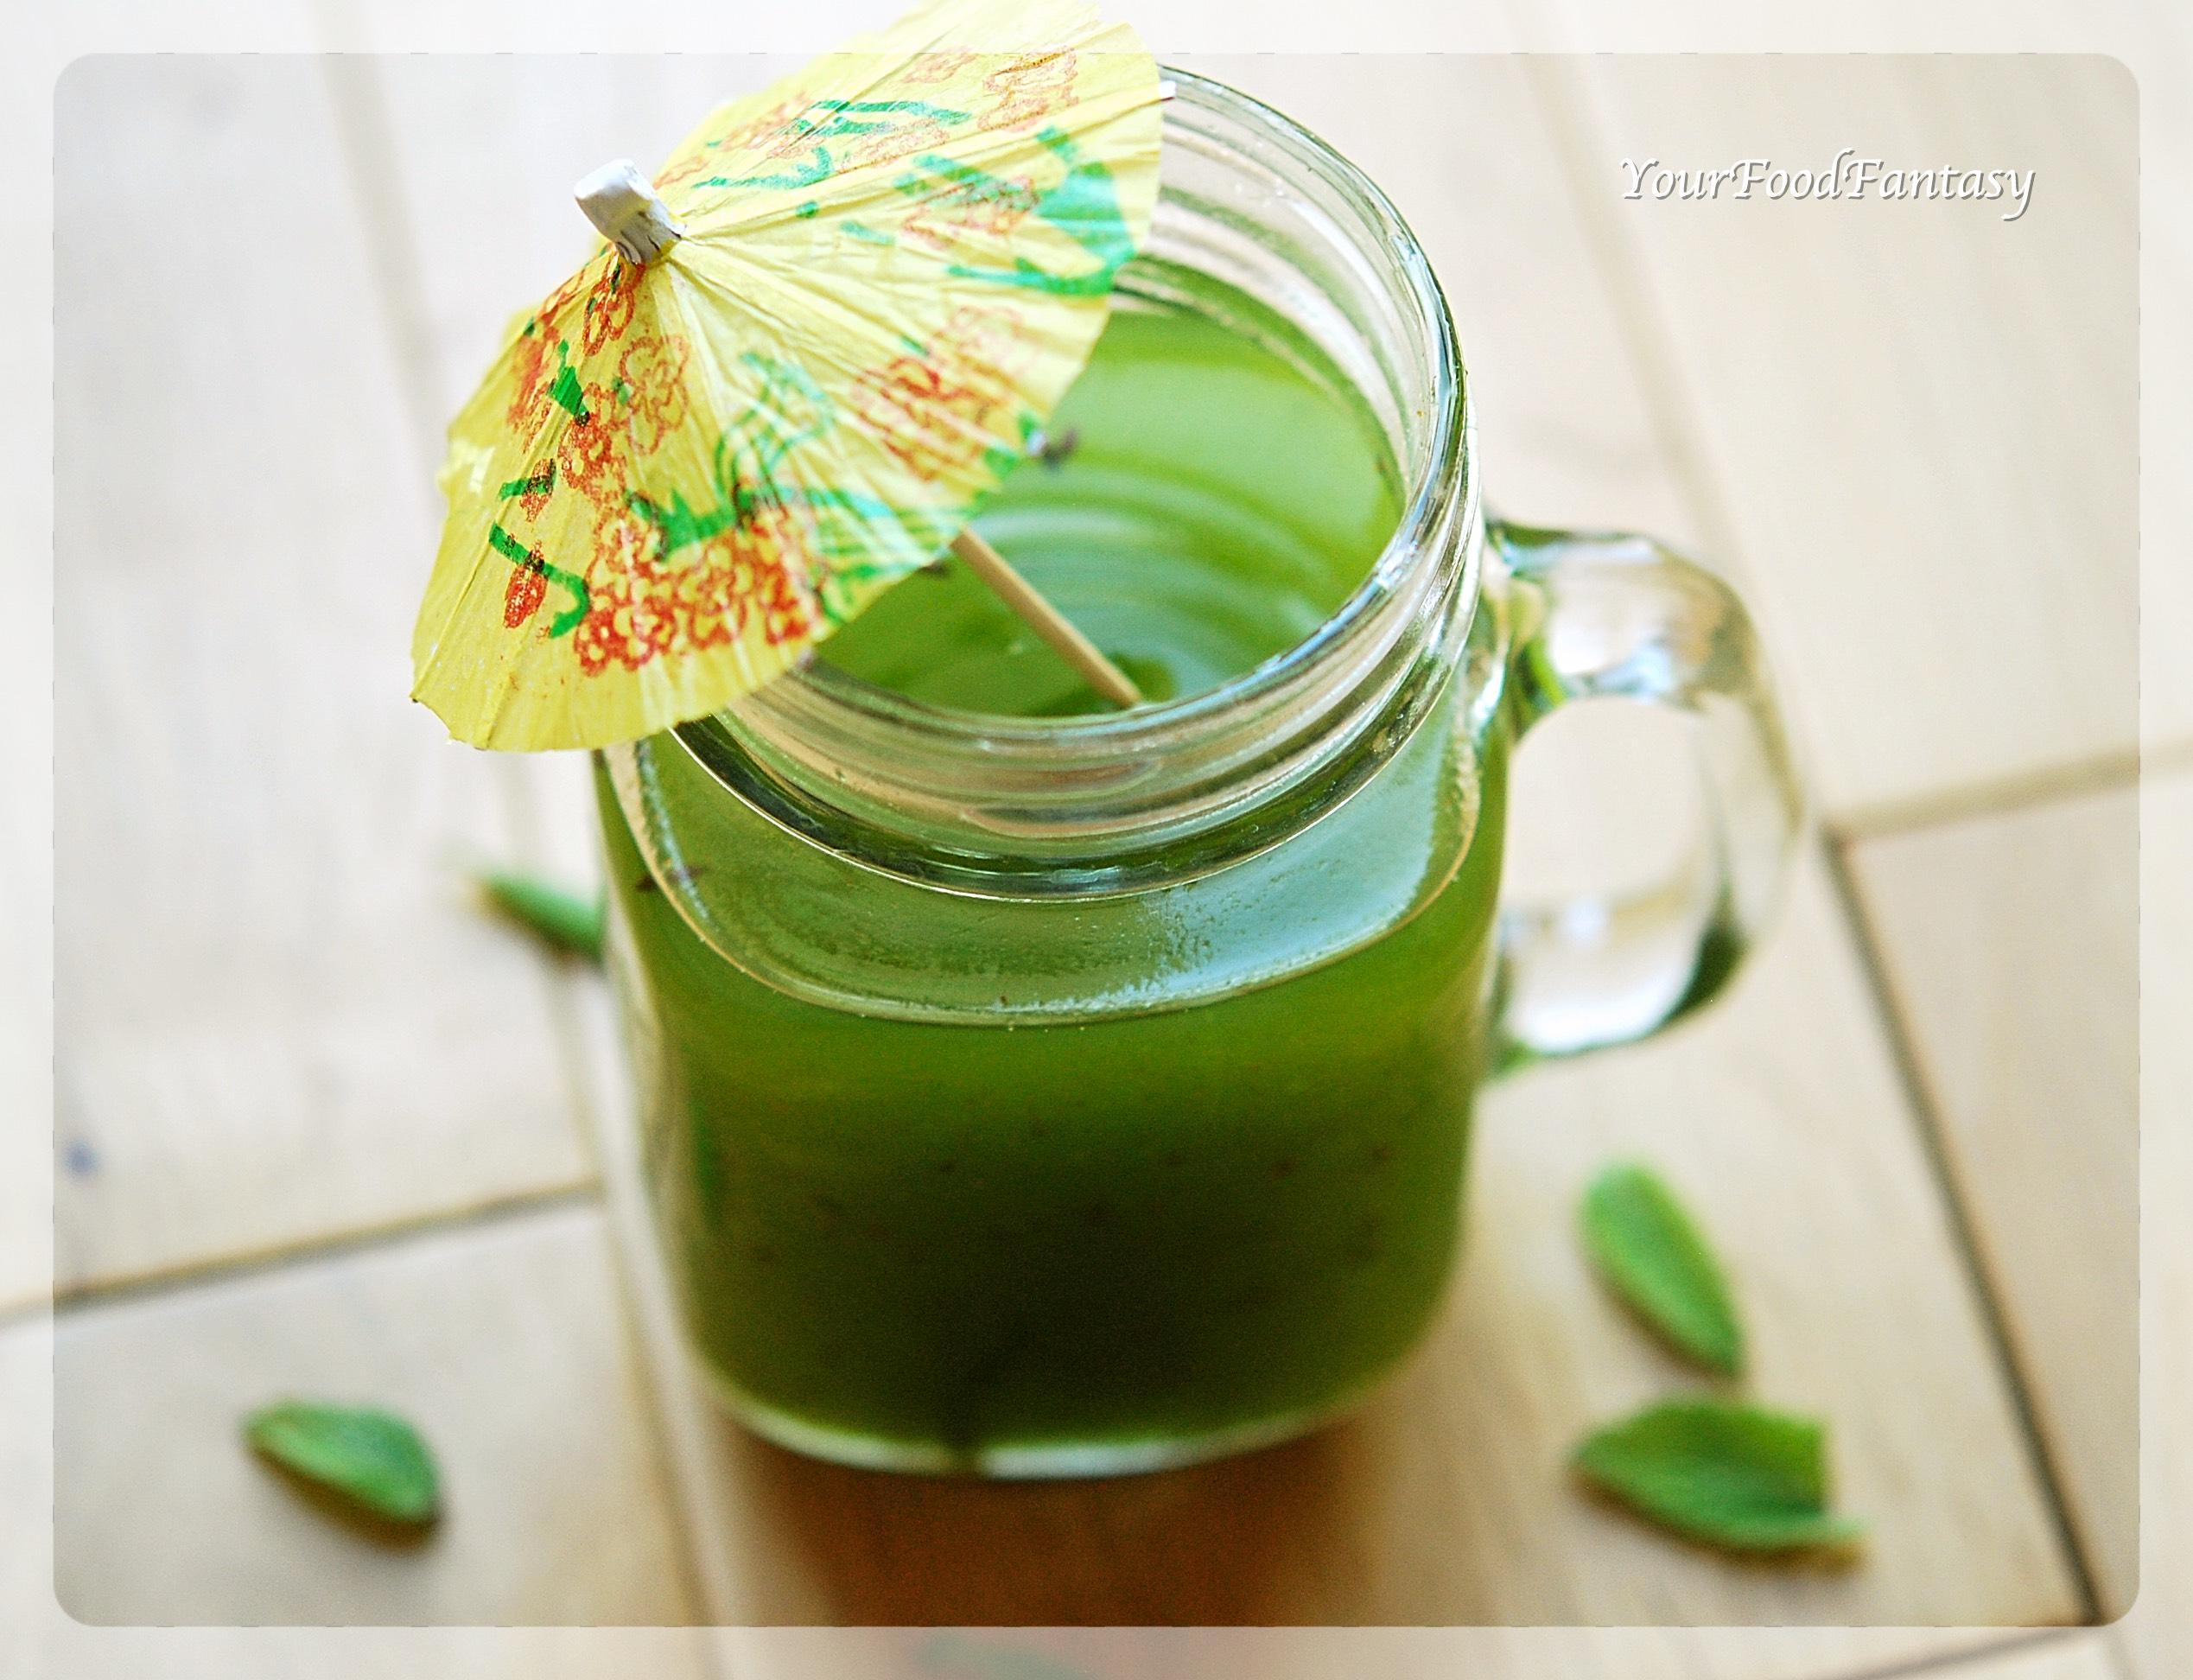 Raw Mango Drink - Aam Panna Recipe   YourFoodFantasy.com